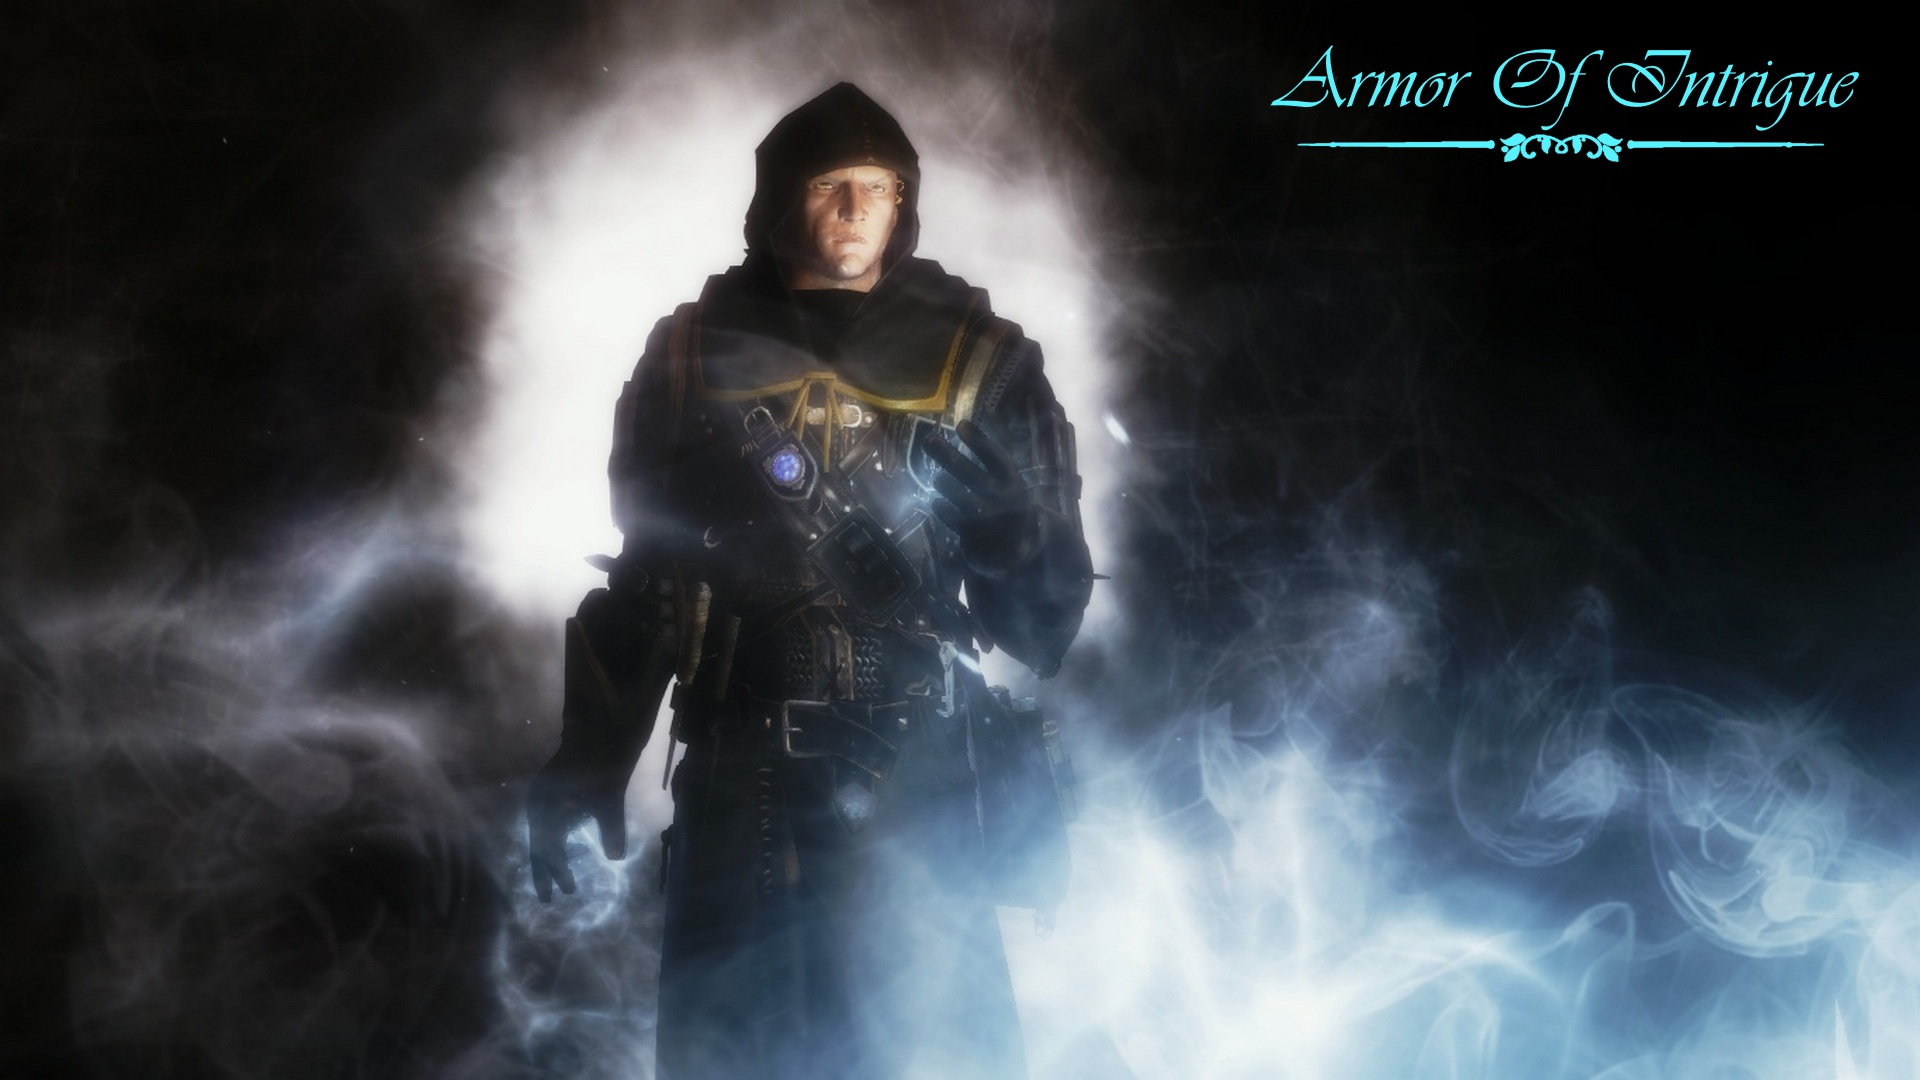 Armor_Of_Intrigue.jpg